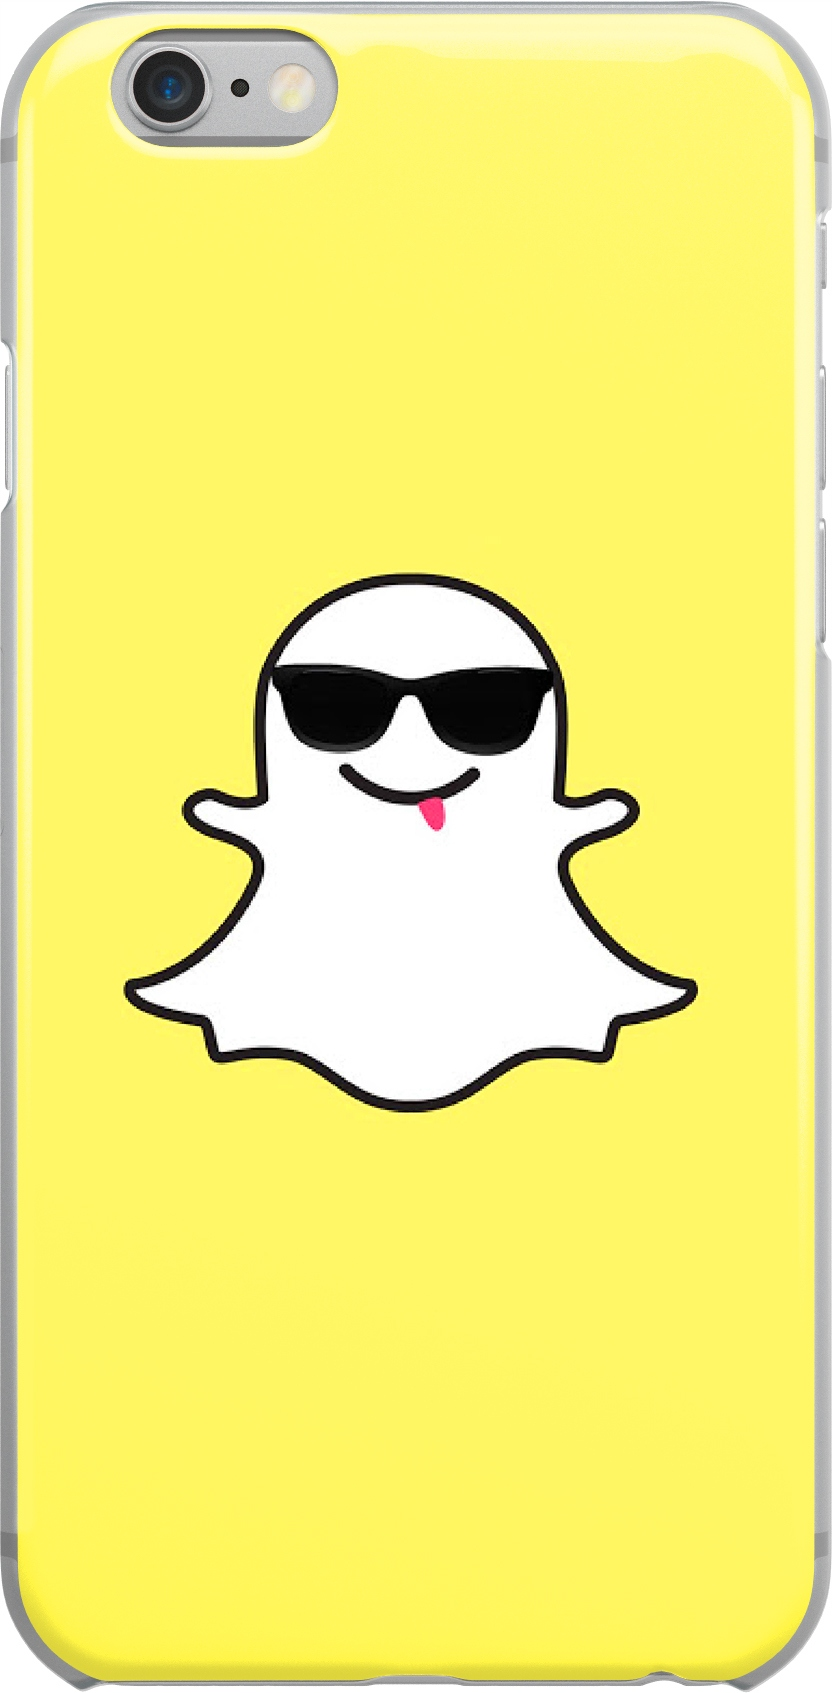 Etui Wzory Snapchat Huawei G730